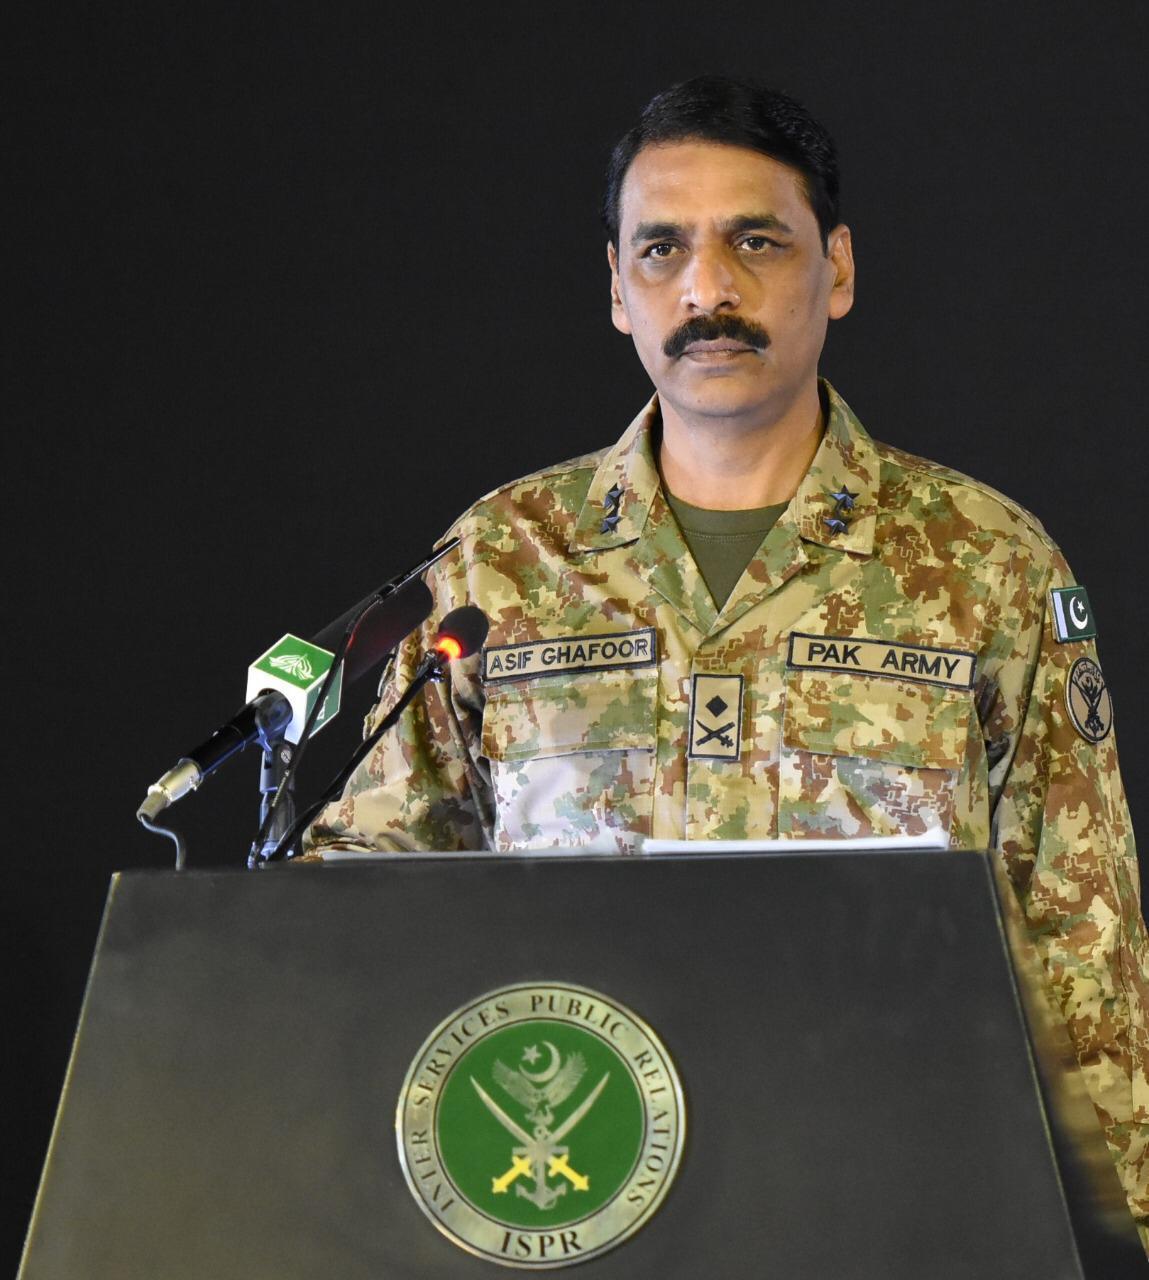 dg ispr major general asif ghafoor addresses a press conference on monday photo ispr